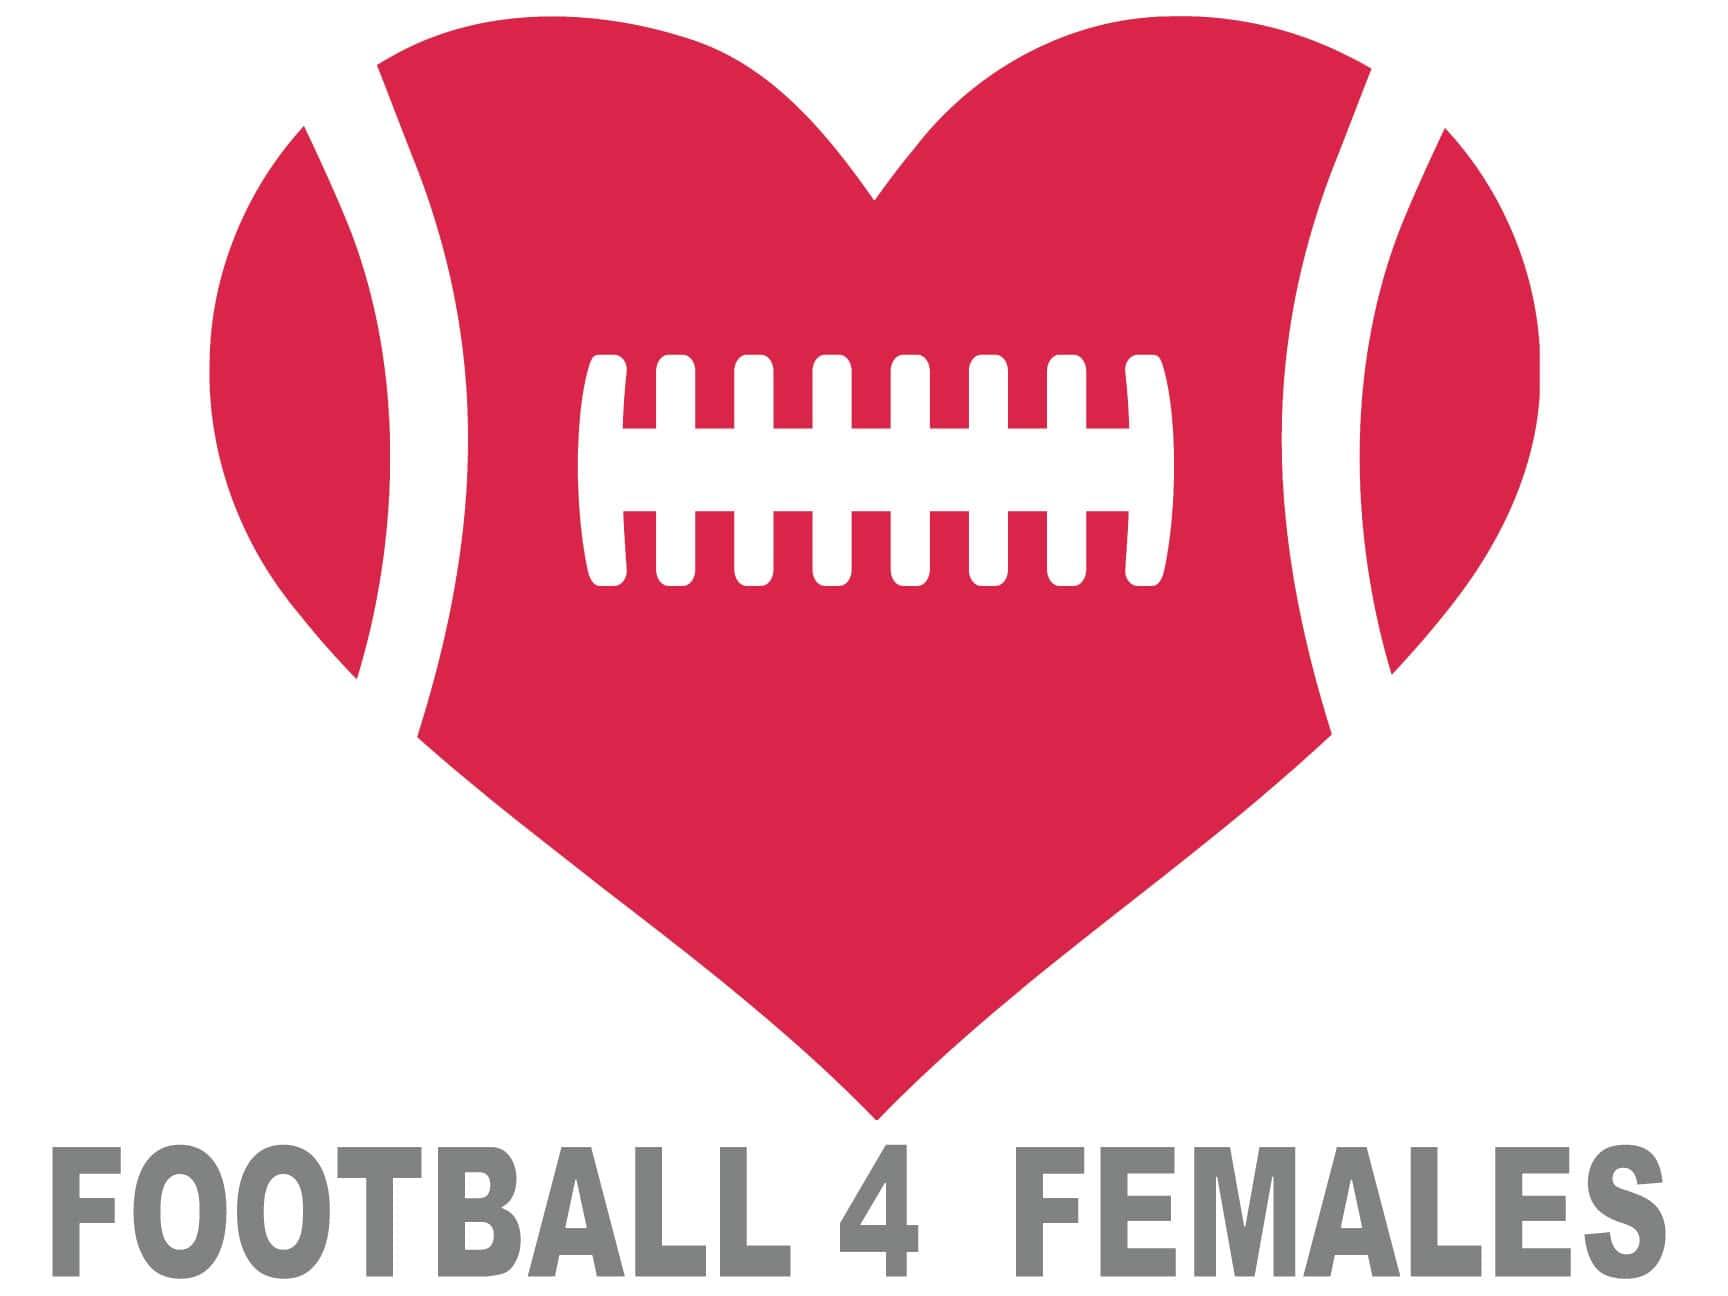 football heart clipart - photo #13